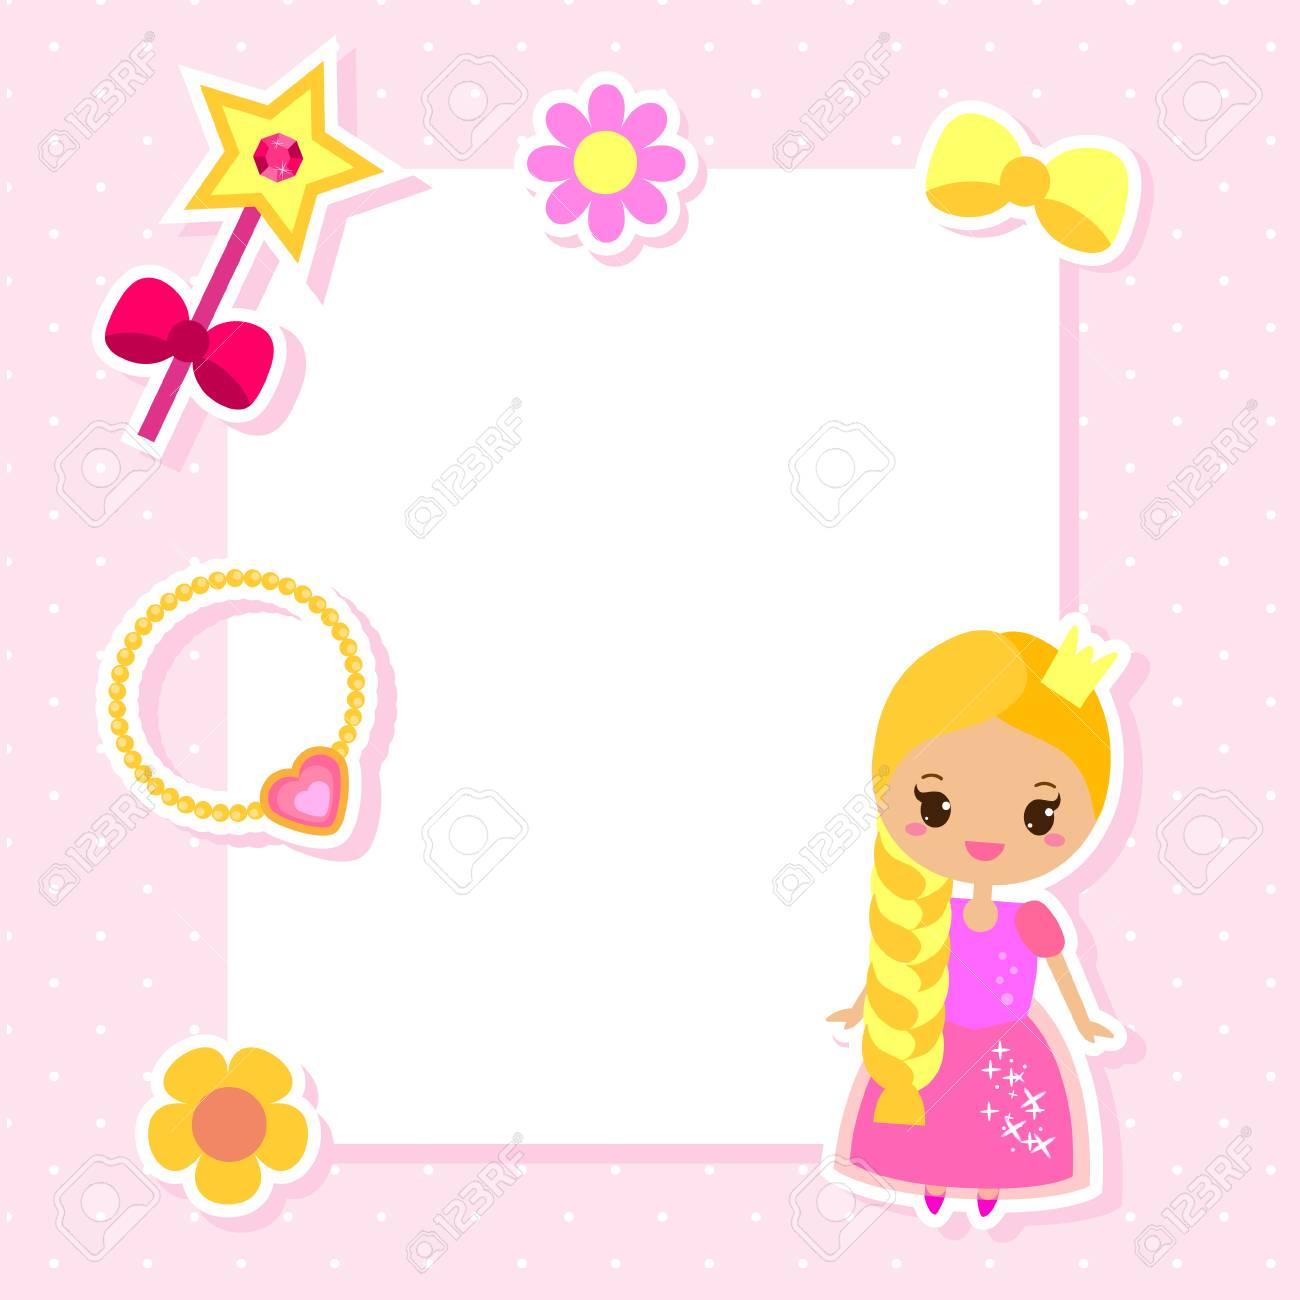 Princess Frame Design Template For Photos Children Diplomas